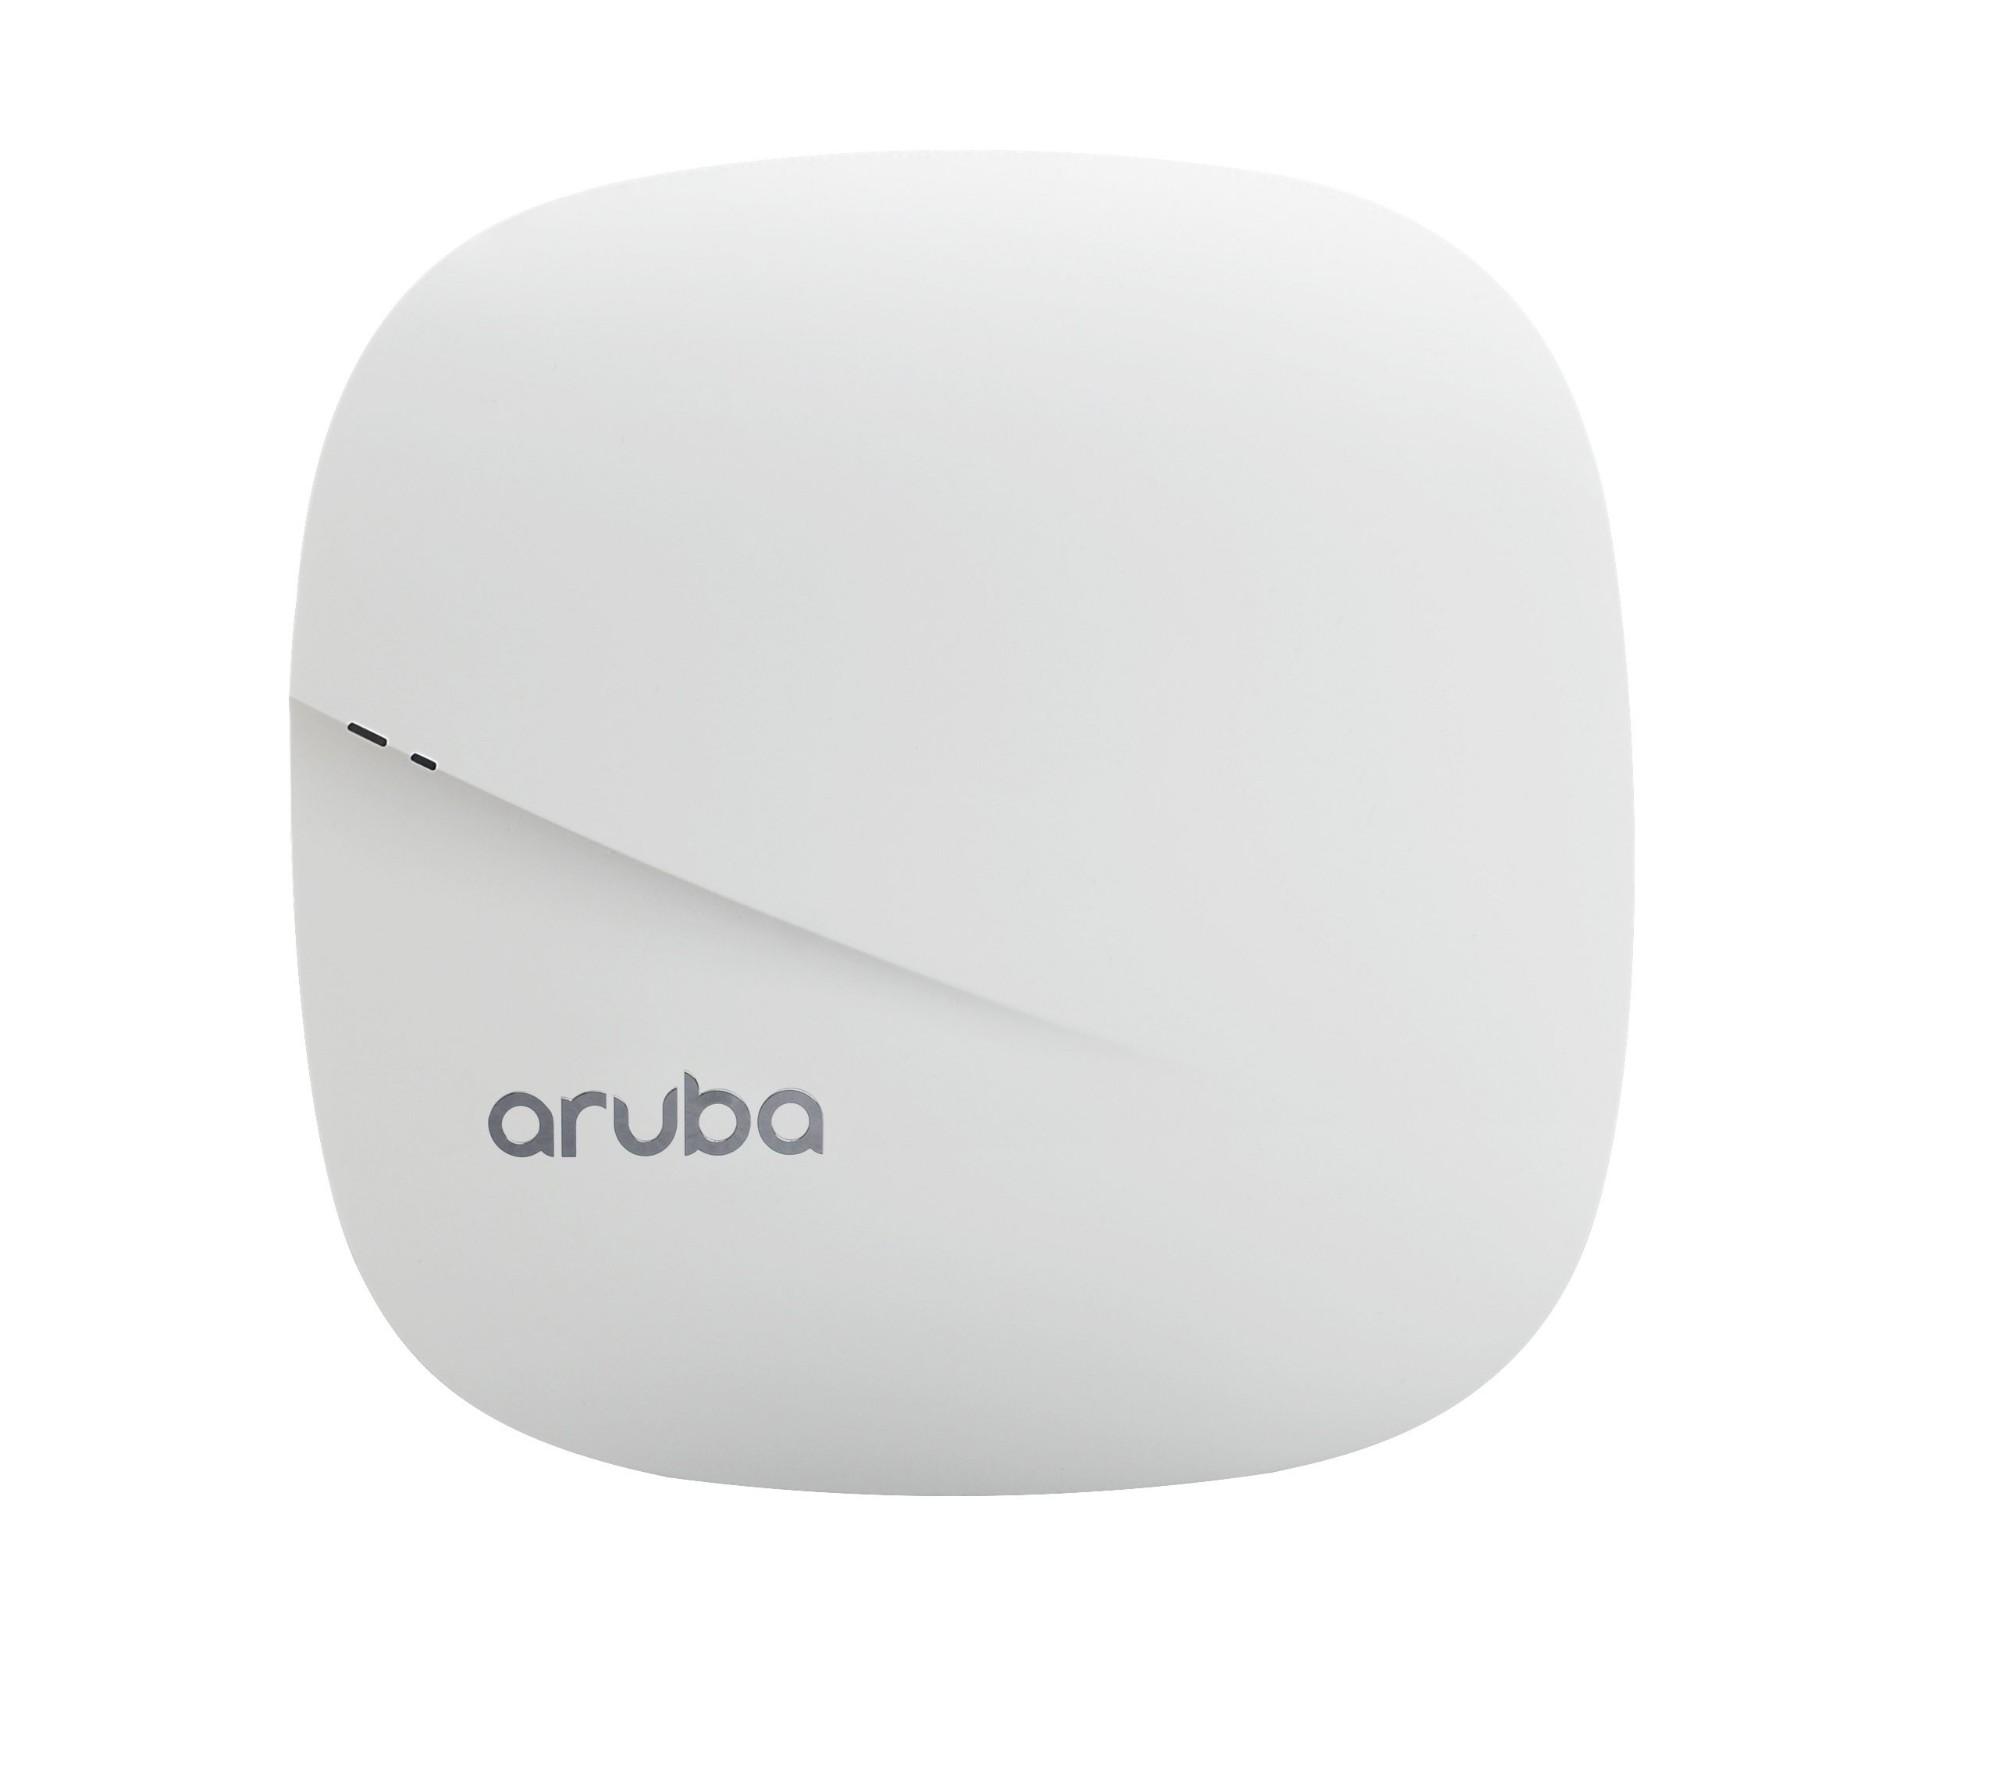 Hewlett Packard Enterprise Aruba Instant IAP-305 (RW) (5x JX945A) WLAN access point 1600 Mbit/s Power over Ethernet (PoE) White